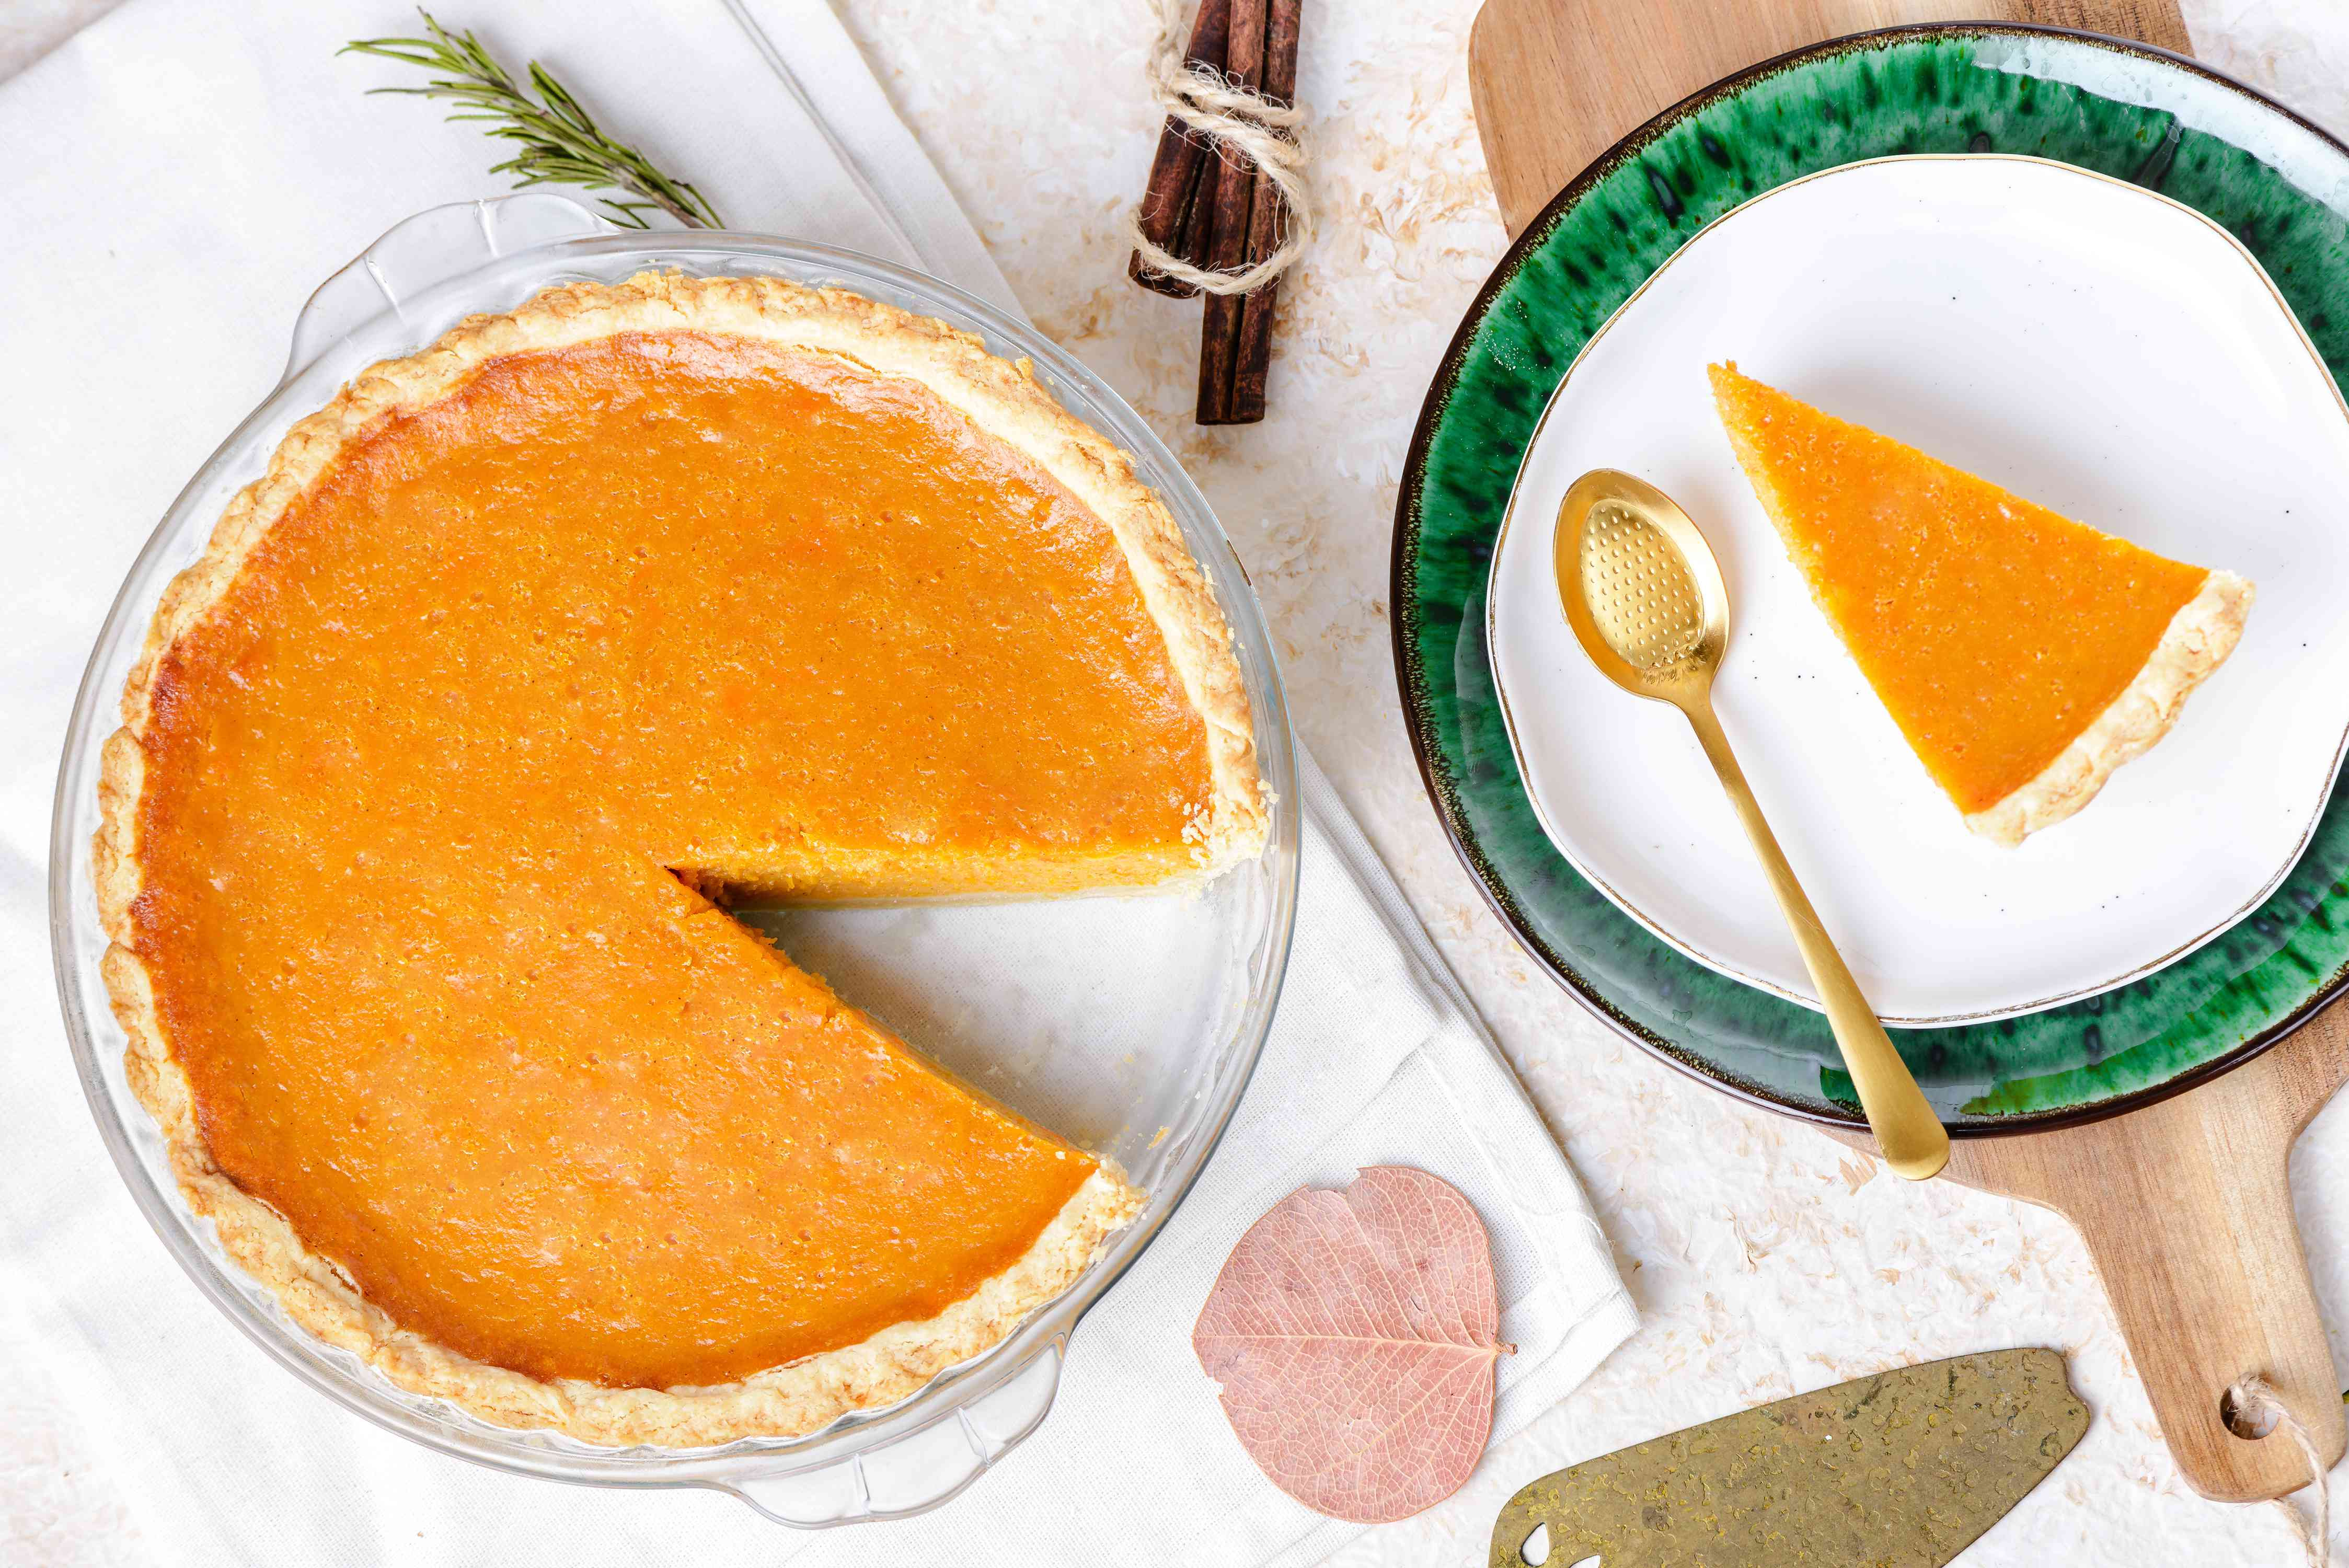 Let cool and serve pumpkin pie.